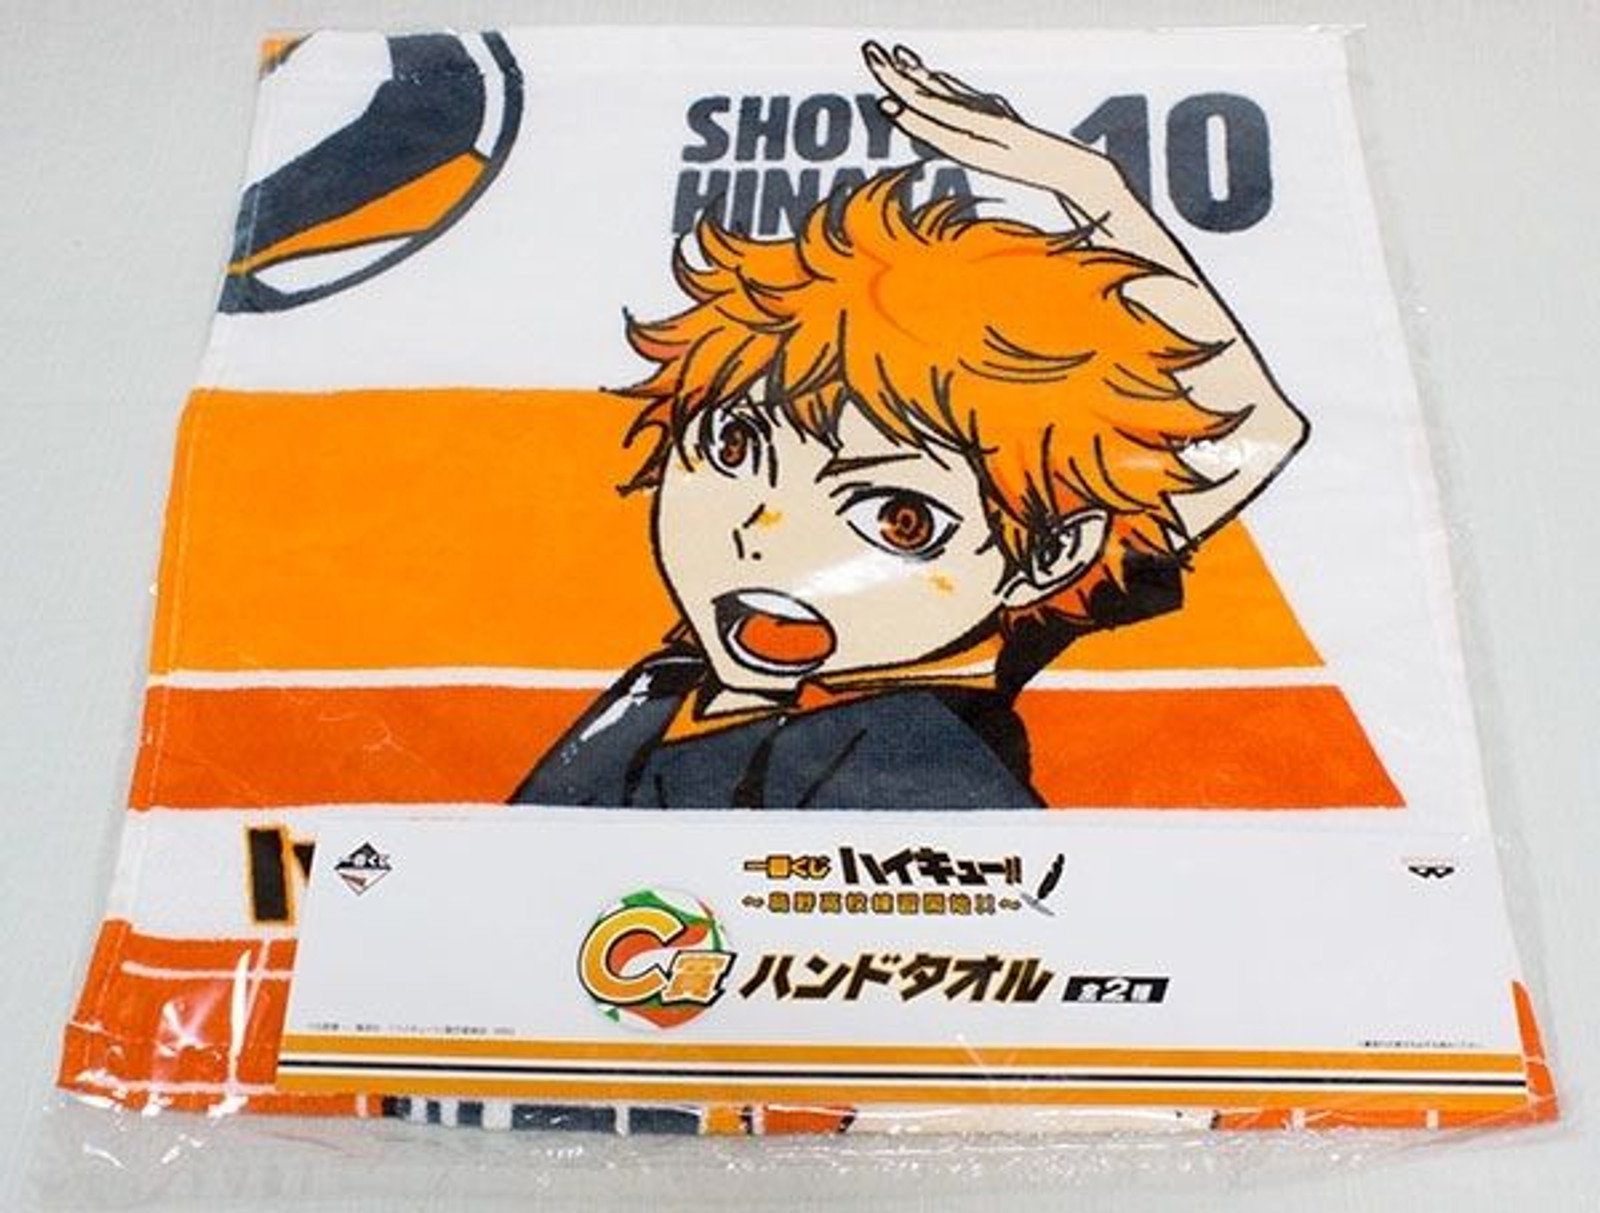 Haikyu!! Ichiban Kuji Prize: C Hand Towel Hinata Banpresto JAPAN ANIME SHONEN JUMP